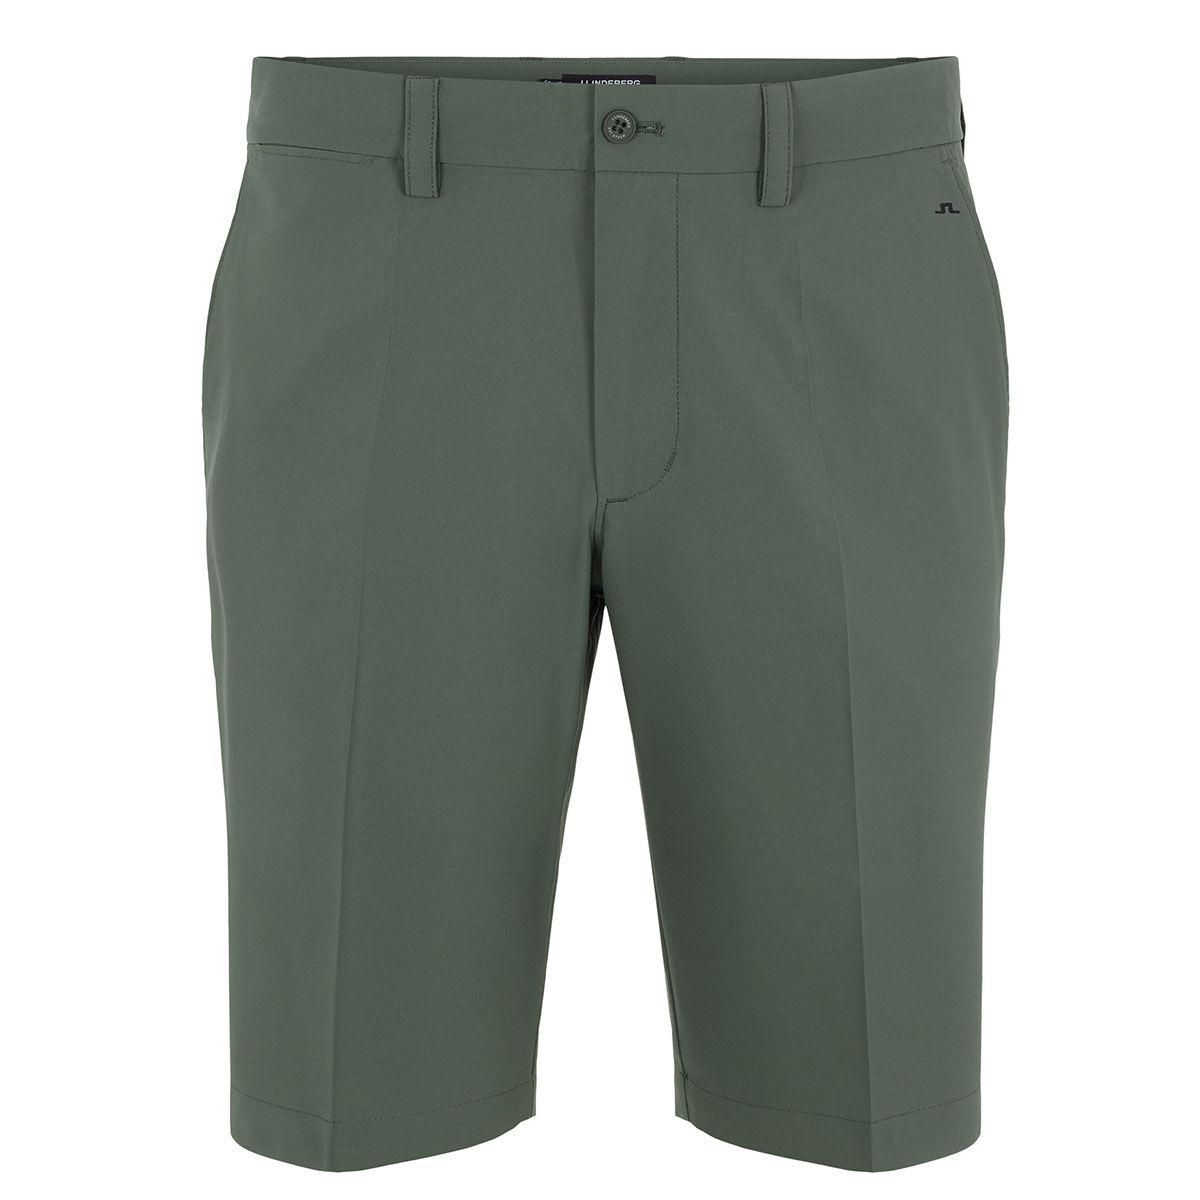 J.Lindeberg Mens Green Lightweight Embroidered Somle Golf Shorts, Size: 32 | American Golf